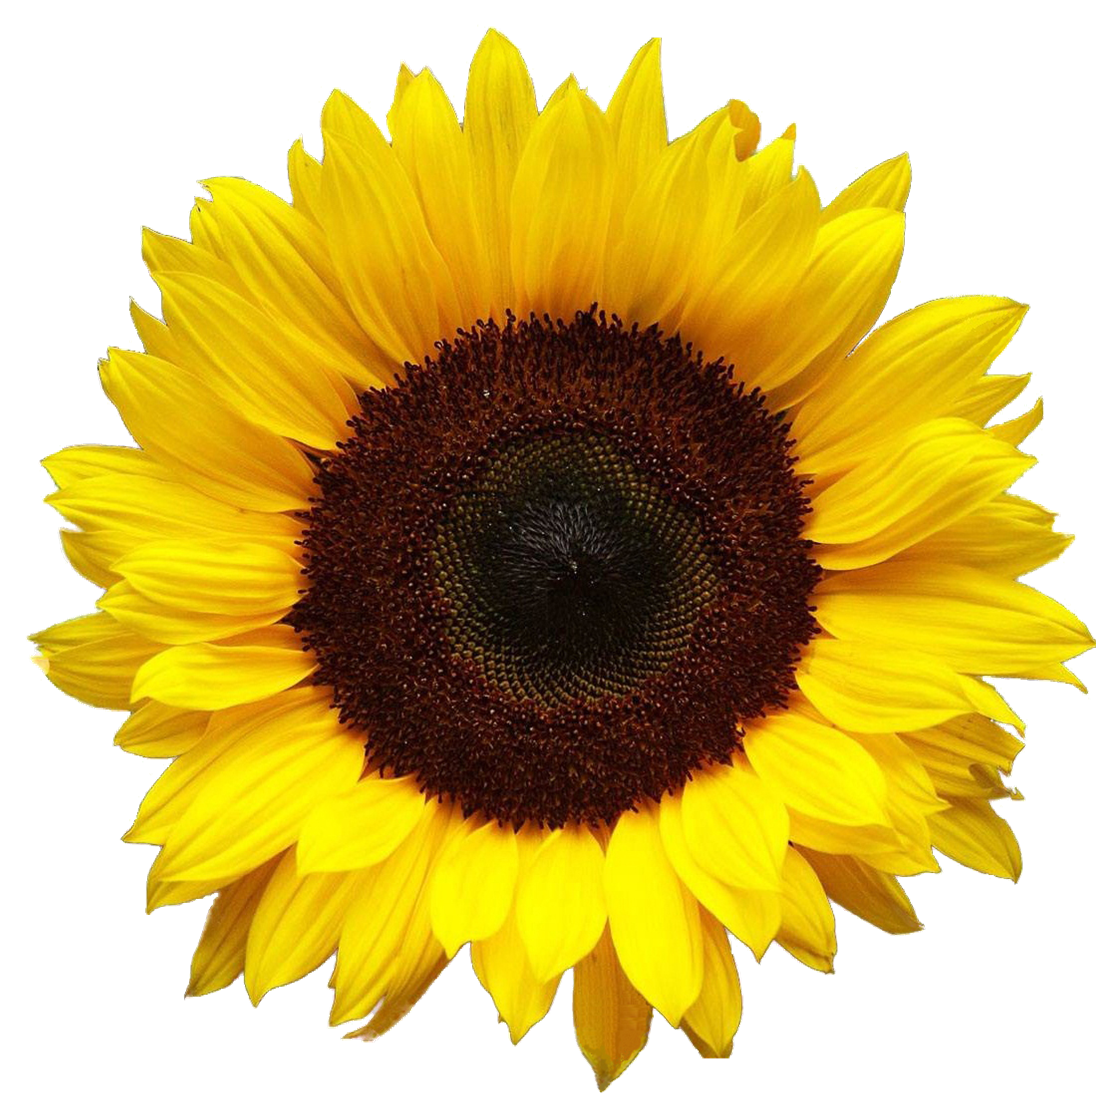 Sunflower PNG HD SVG Clip arts